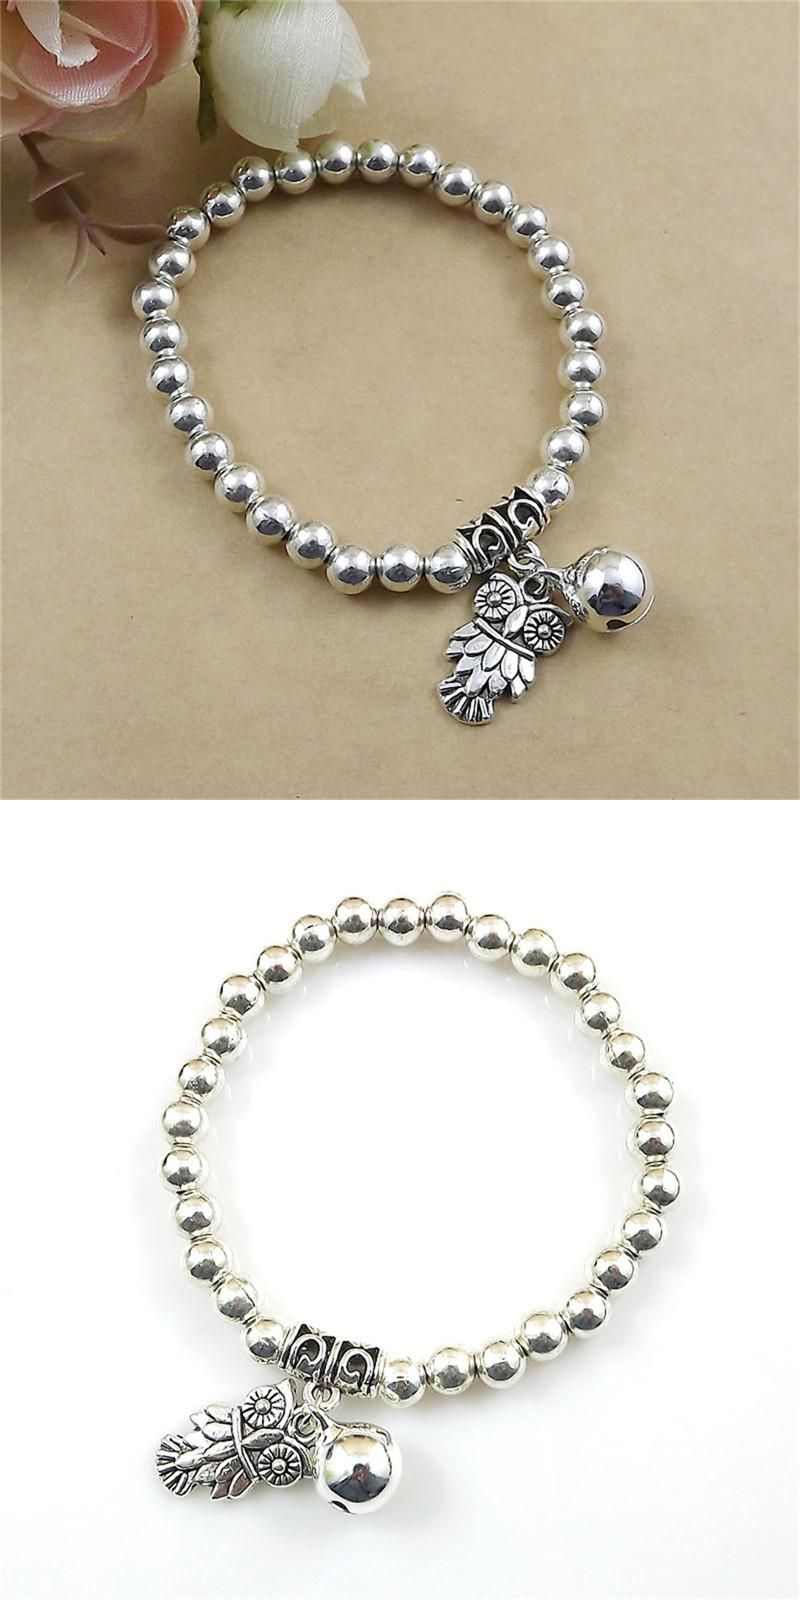 Visit to buy owl bird animal wisdom design silver tone beads